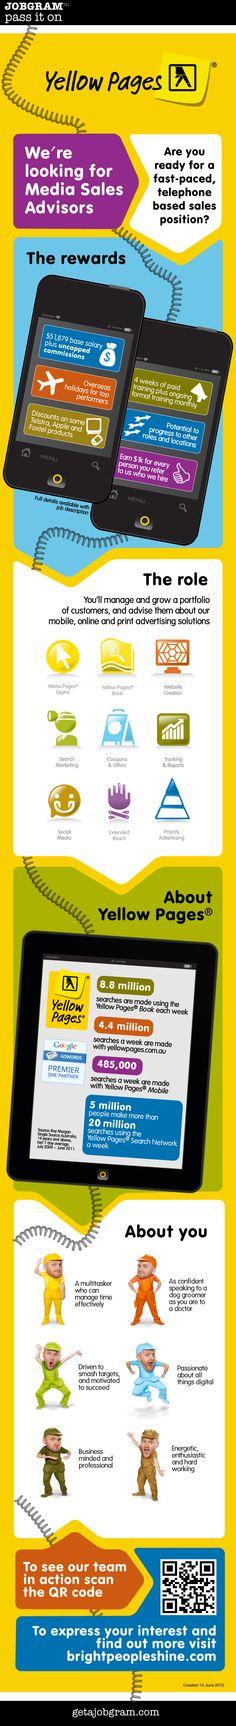 New Jobgram: Australia's Yellow Pages® is hiring telephone based Media Sales Advisors http://getajobgram.com/post/24986591742/yellowpagestsales